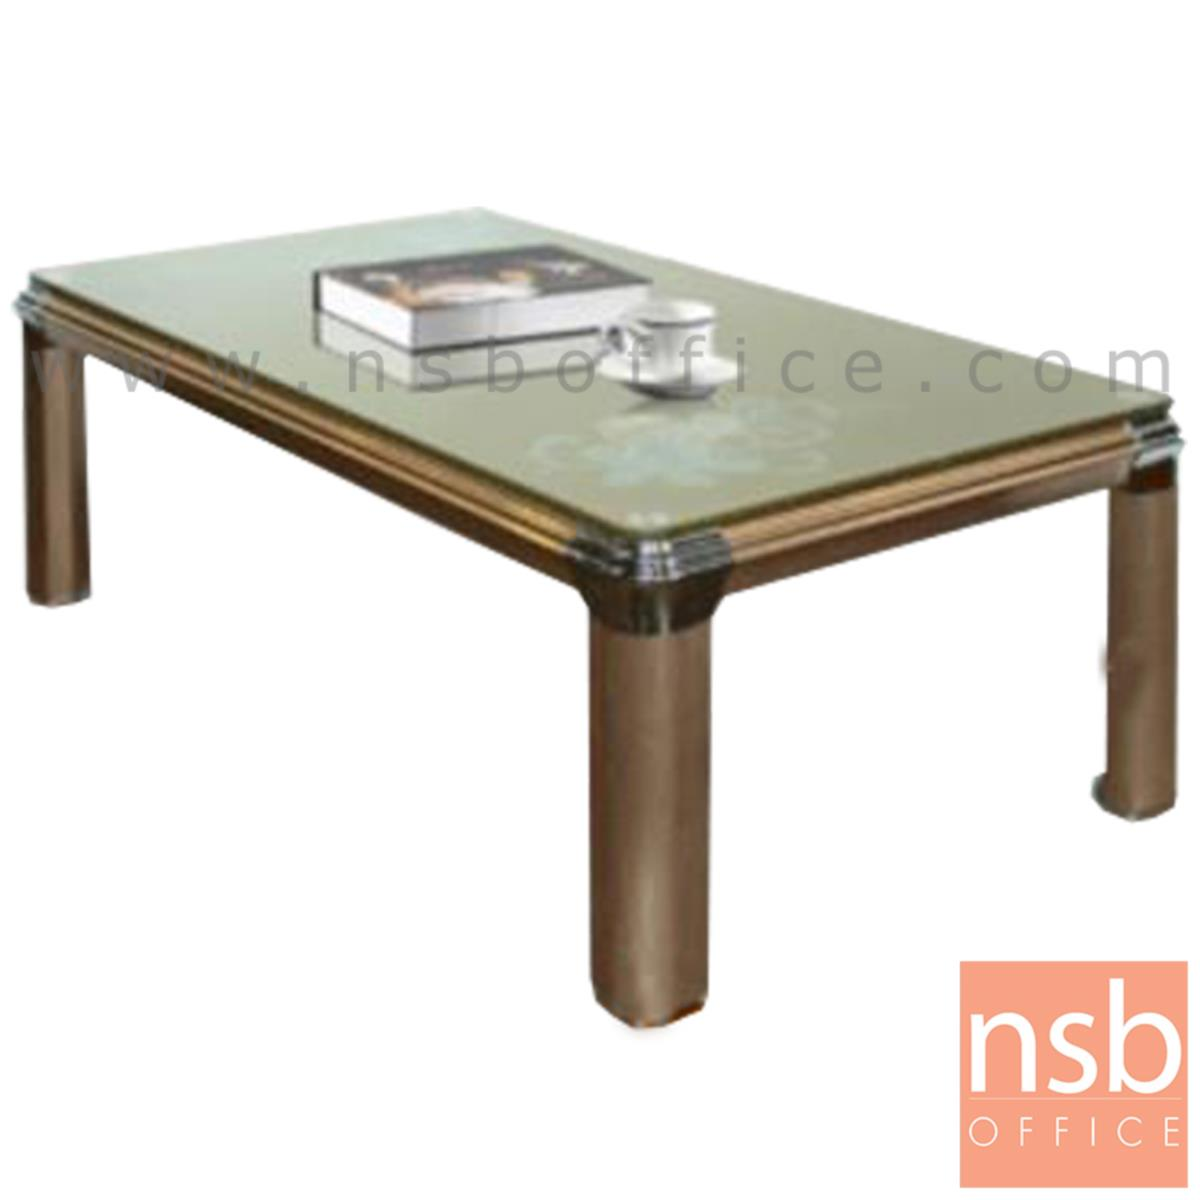 B13A150:โต๊ะกลางกระจกลายดอกไม้ รุ่น Post-punk (โพสต์พังค์) ขนาด 130W cm. โครงอลูมิเนียม